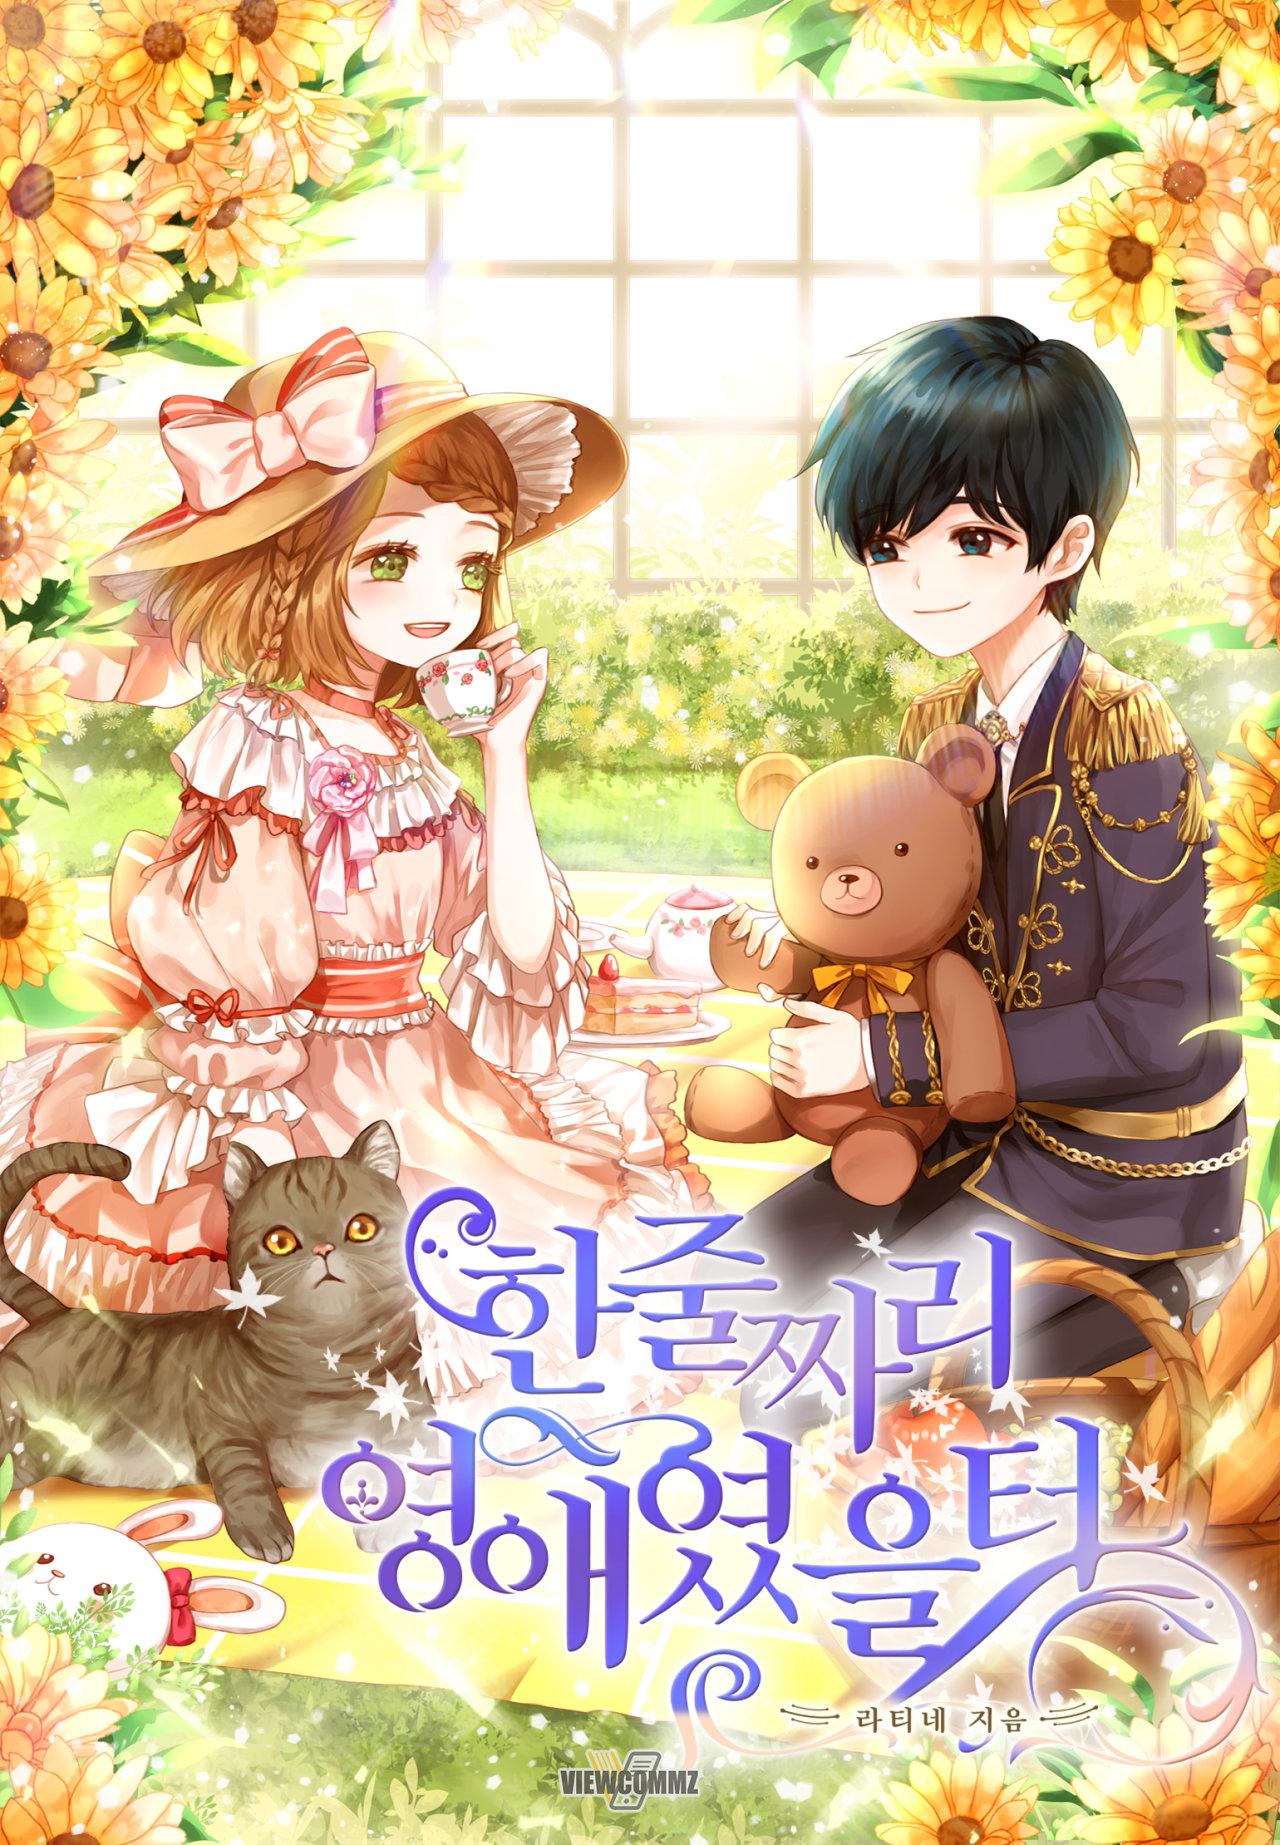 https://nine.mangadogs.com/es_manga/pic8/17/36689/947506/5d60e80620f33c3761dae82fa5e49efd.jpg Page 1